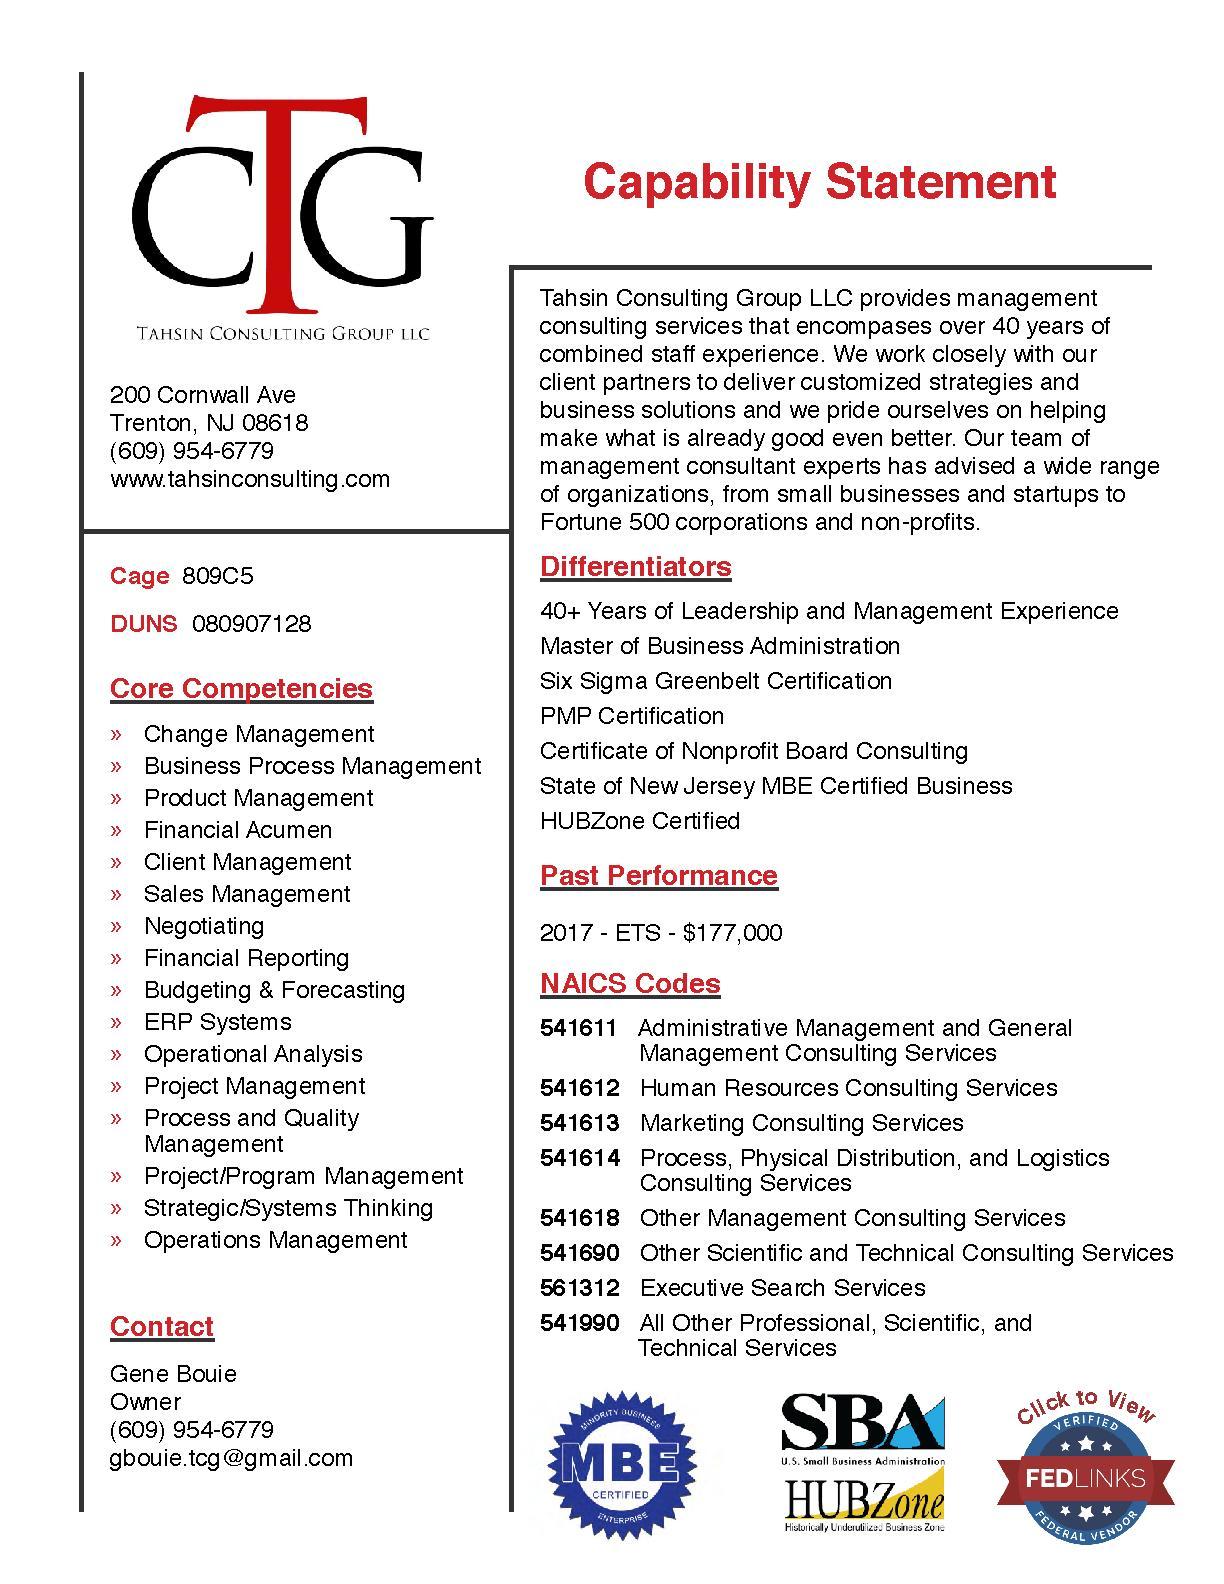 Fedlinks Tahsin Consulting Group Llc Trenton Nj 08618